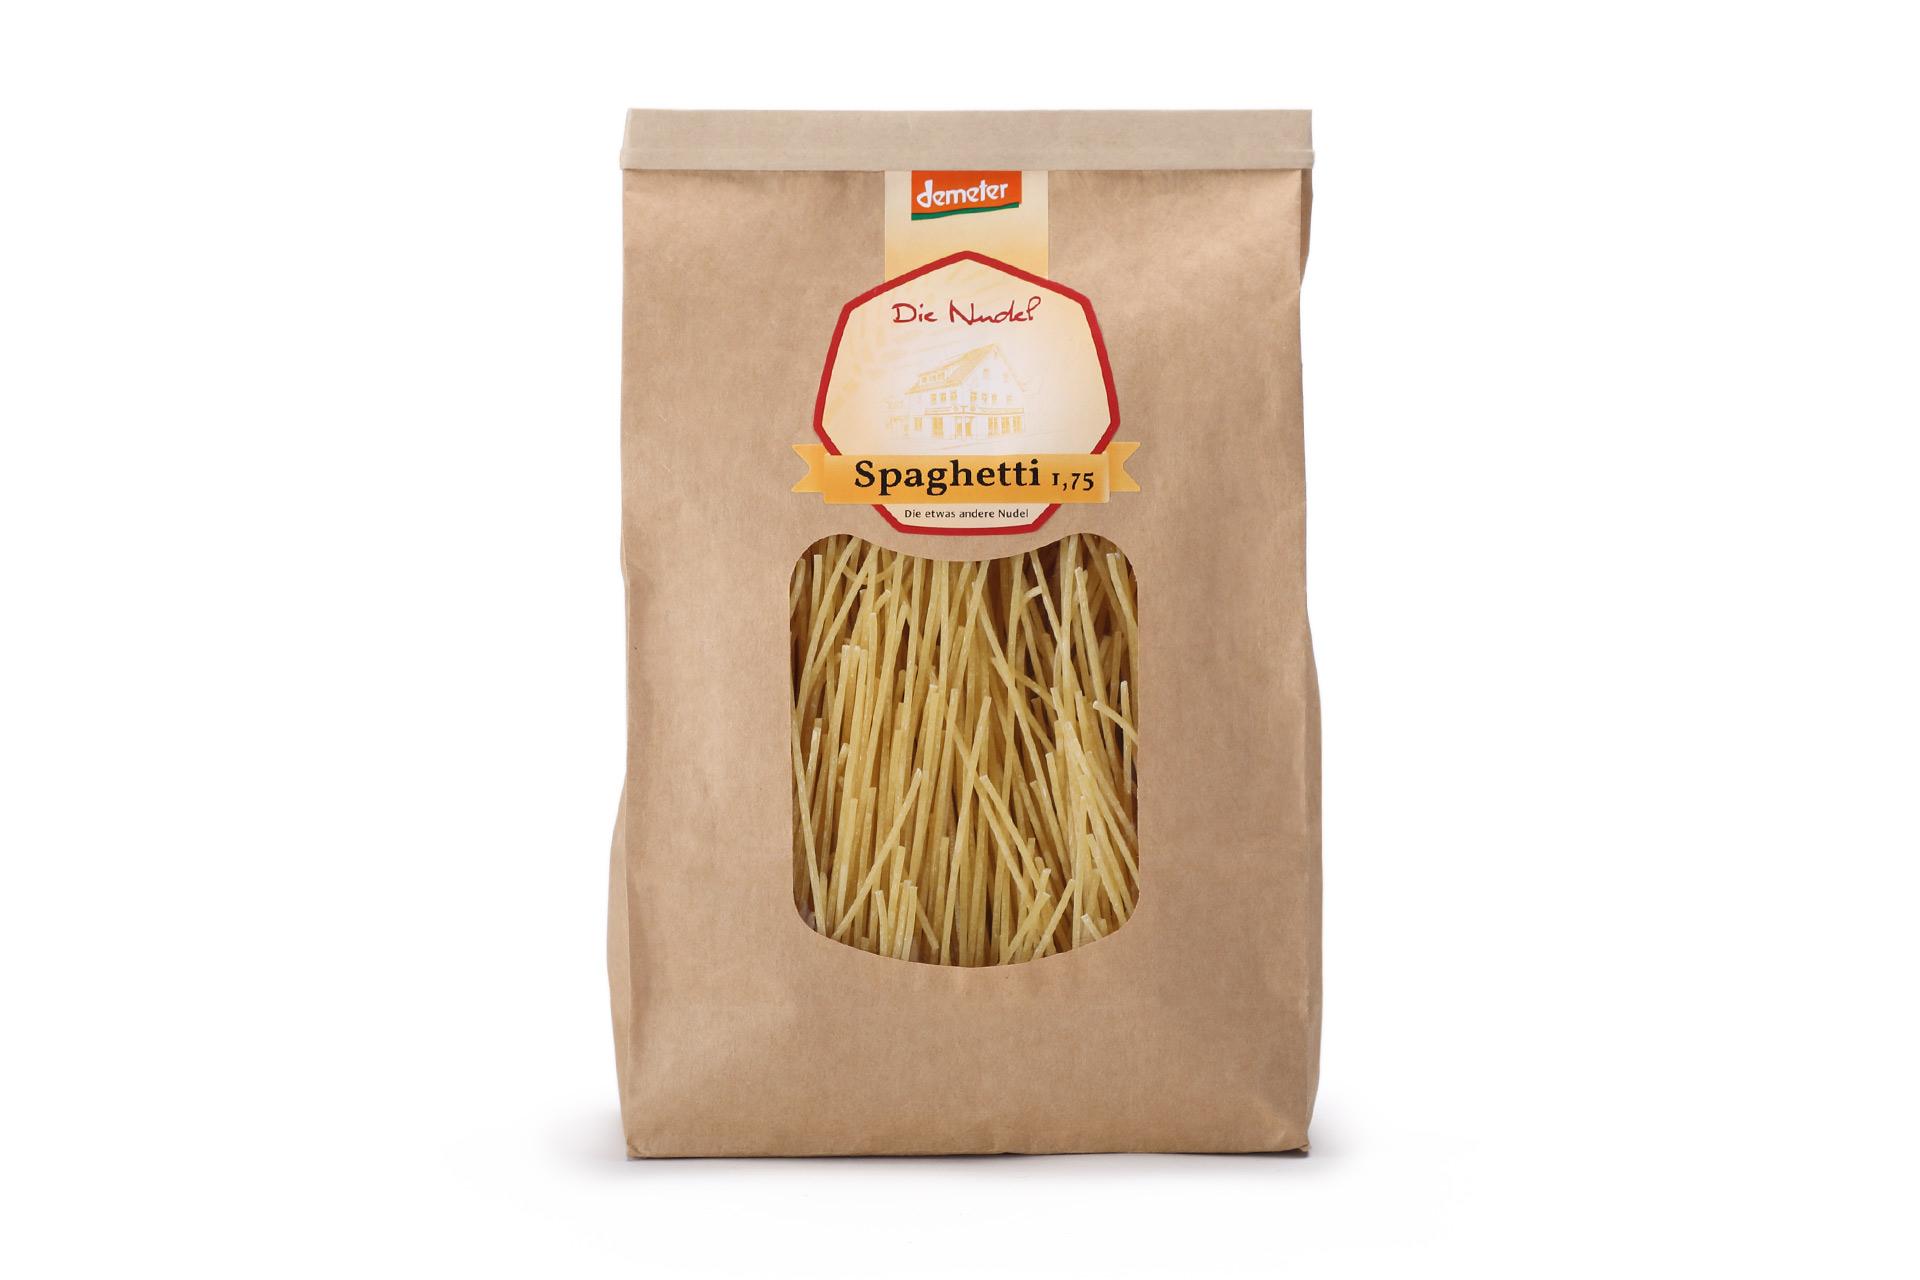 Spaghetti-175-Hartweizengriess-Bio-Verpackung-ksg